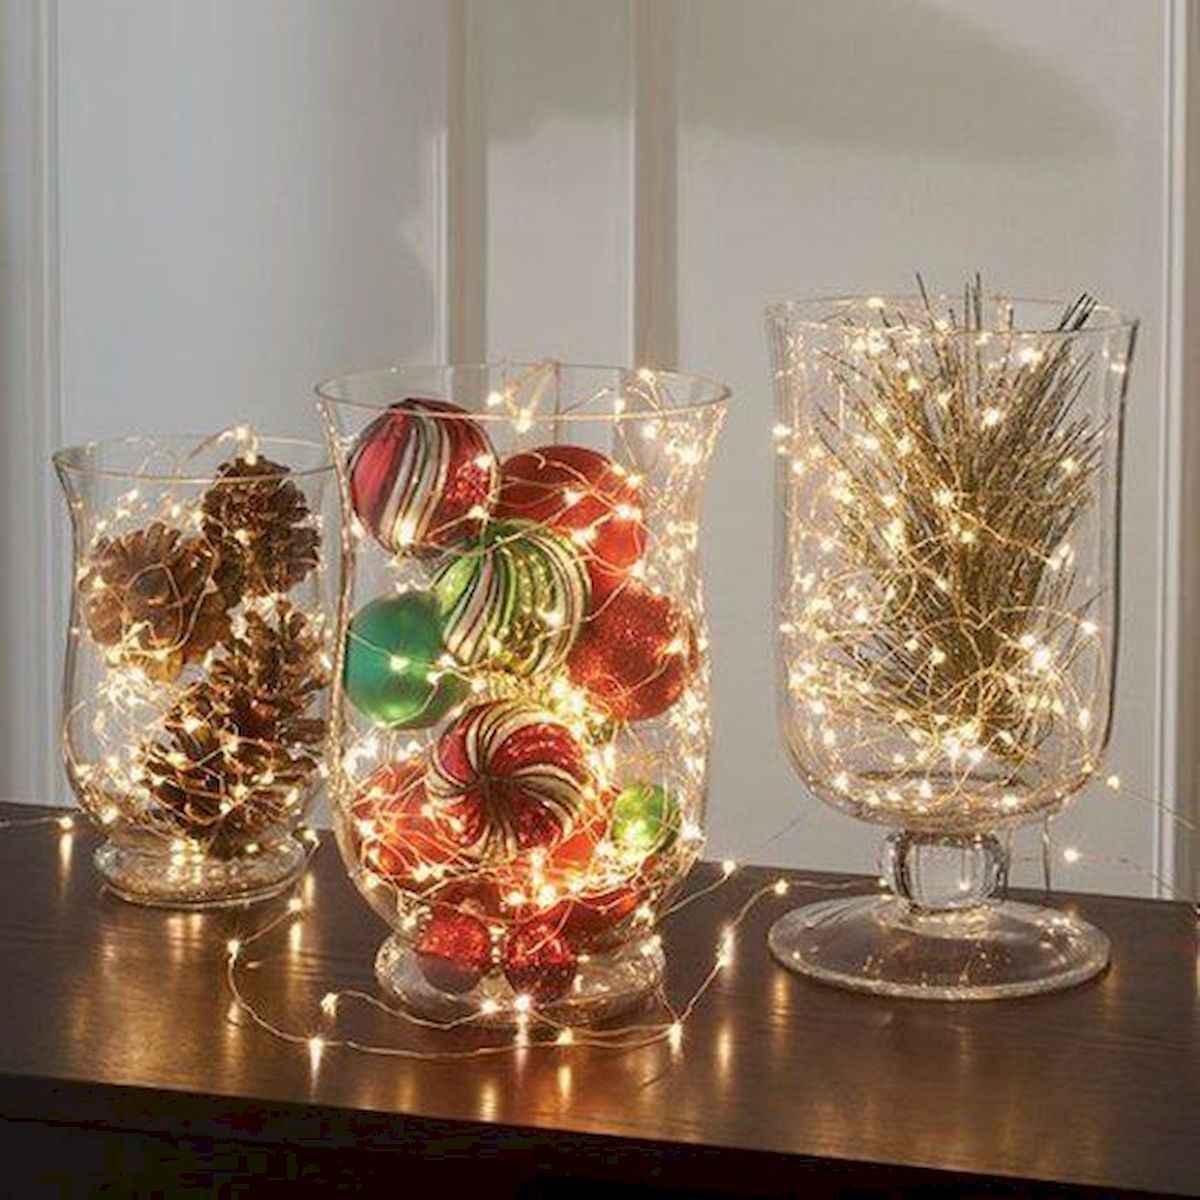 35 Beautiful Christmas Decor Ideas Table Centerpiece (22)